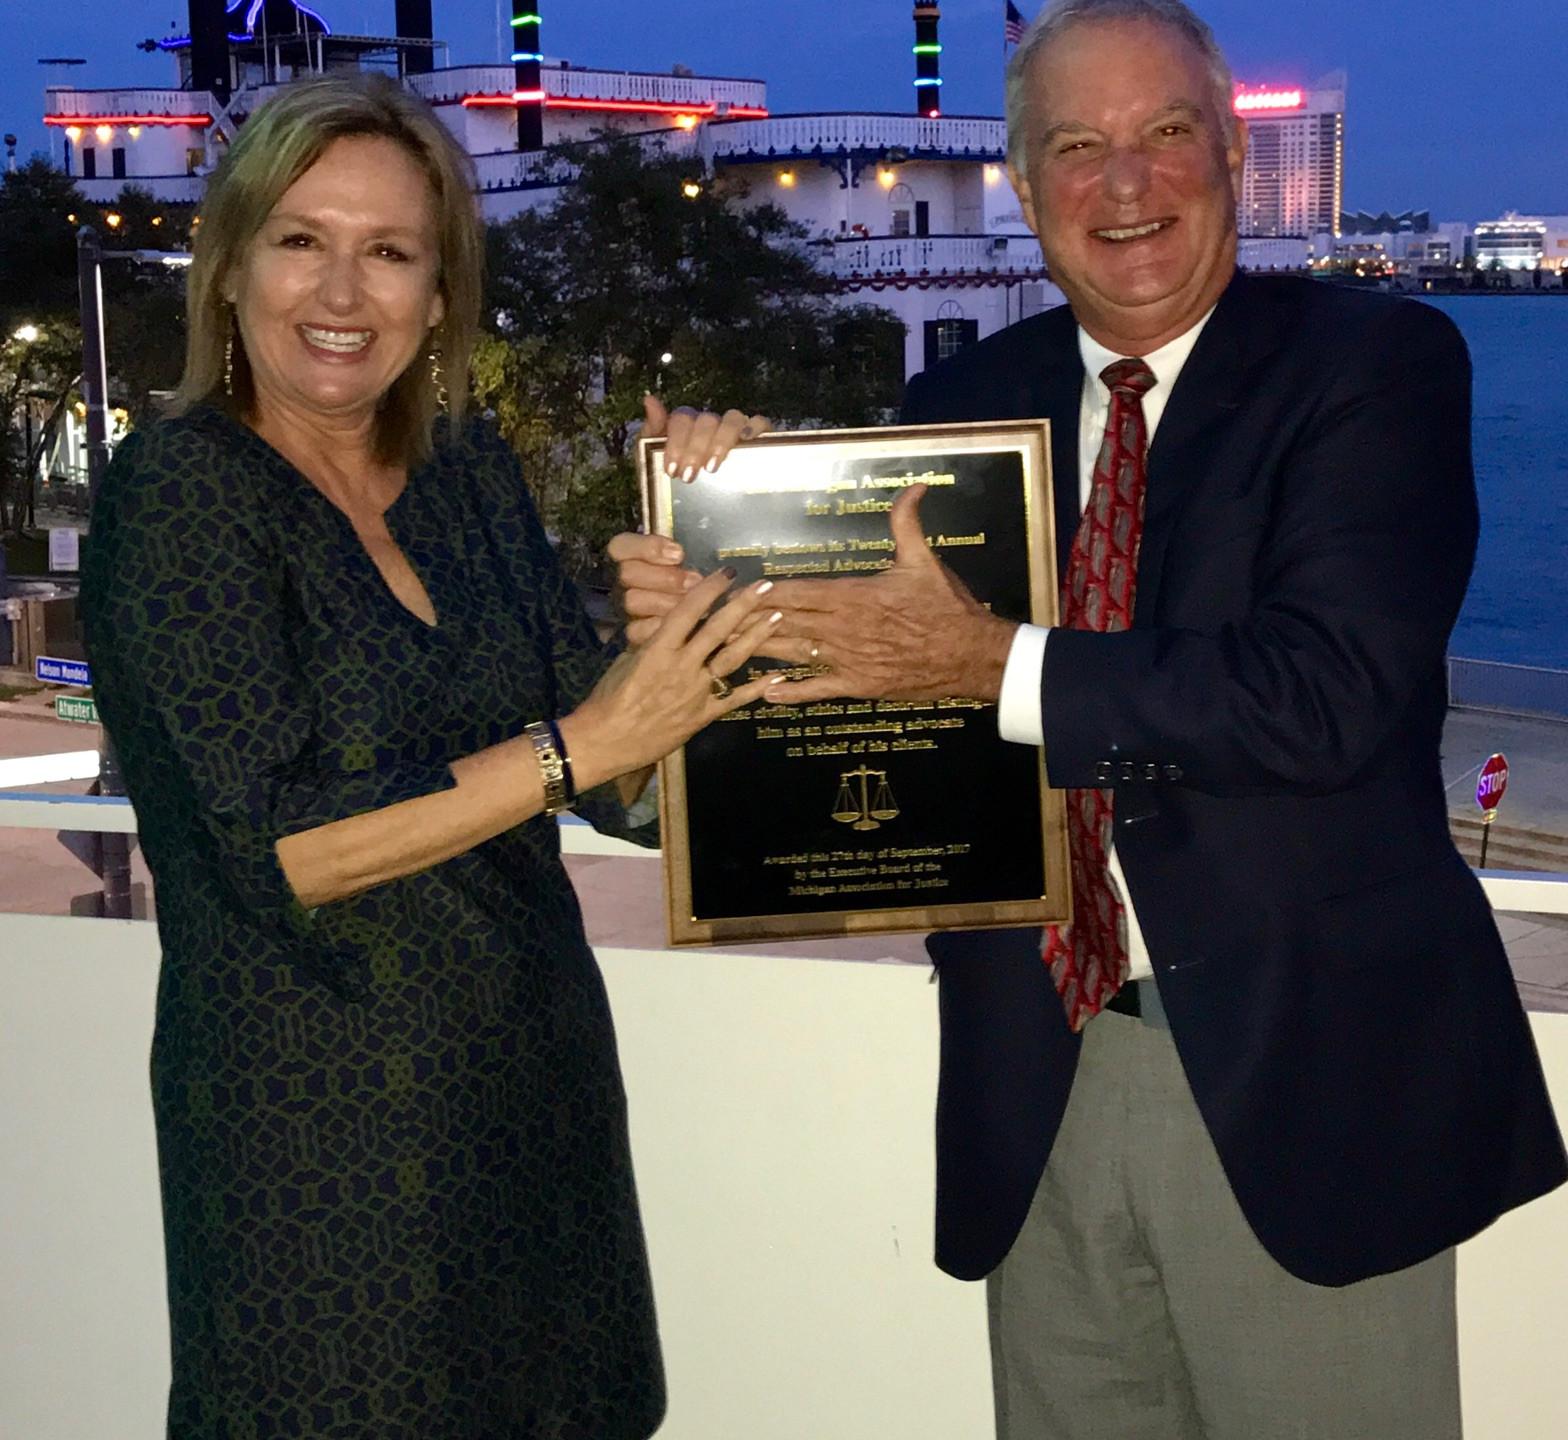 Walt with Brian's award